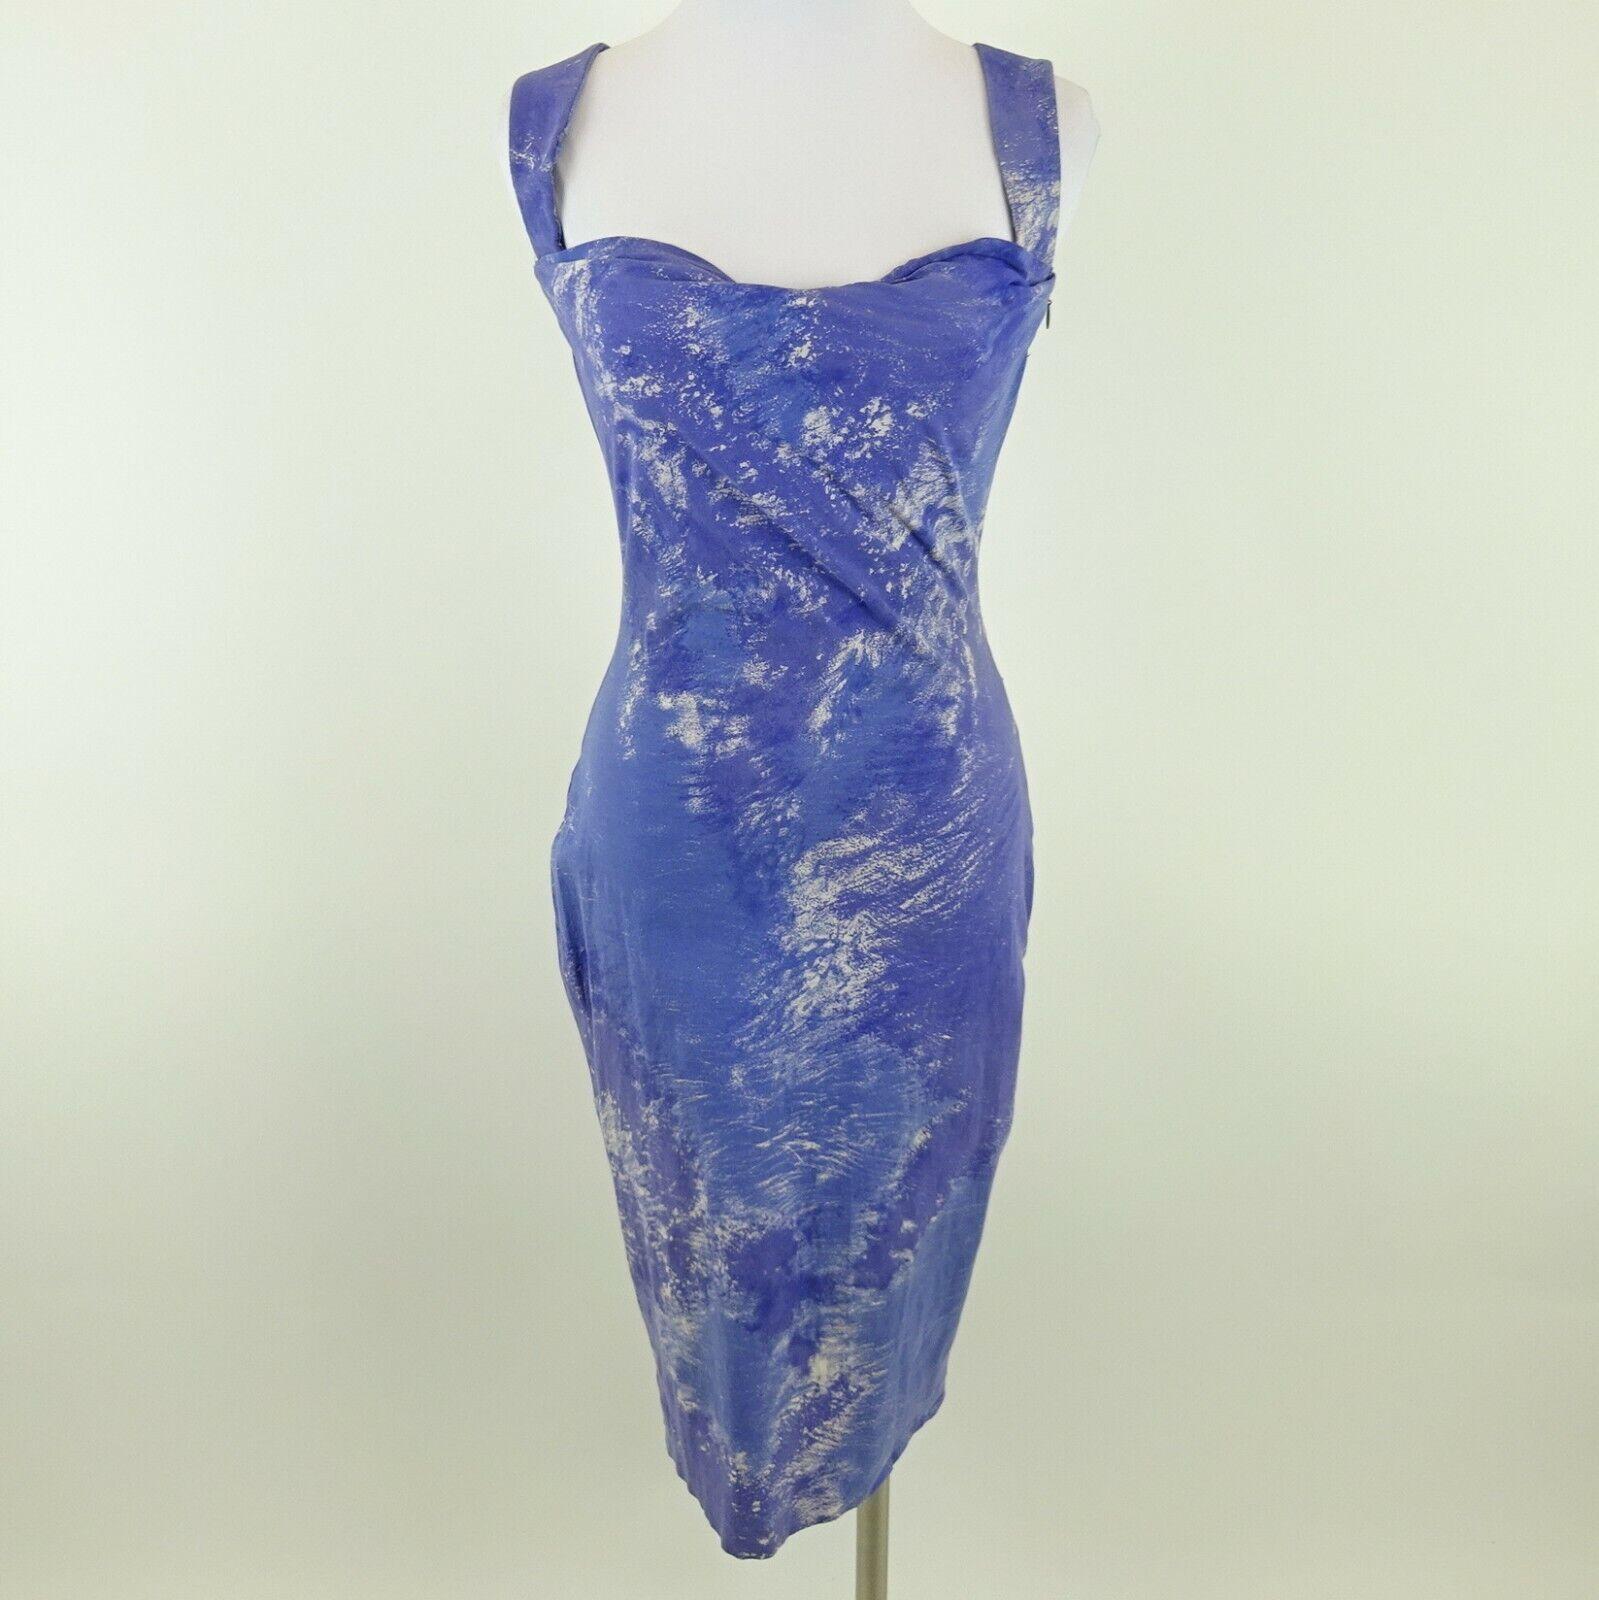 Kim Kardashian West VIVIENNE WESTWOOD Blue and White Dress S/S 1999 Size UK 10